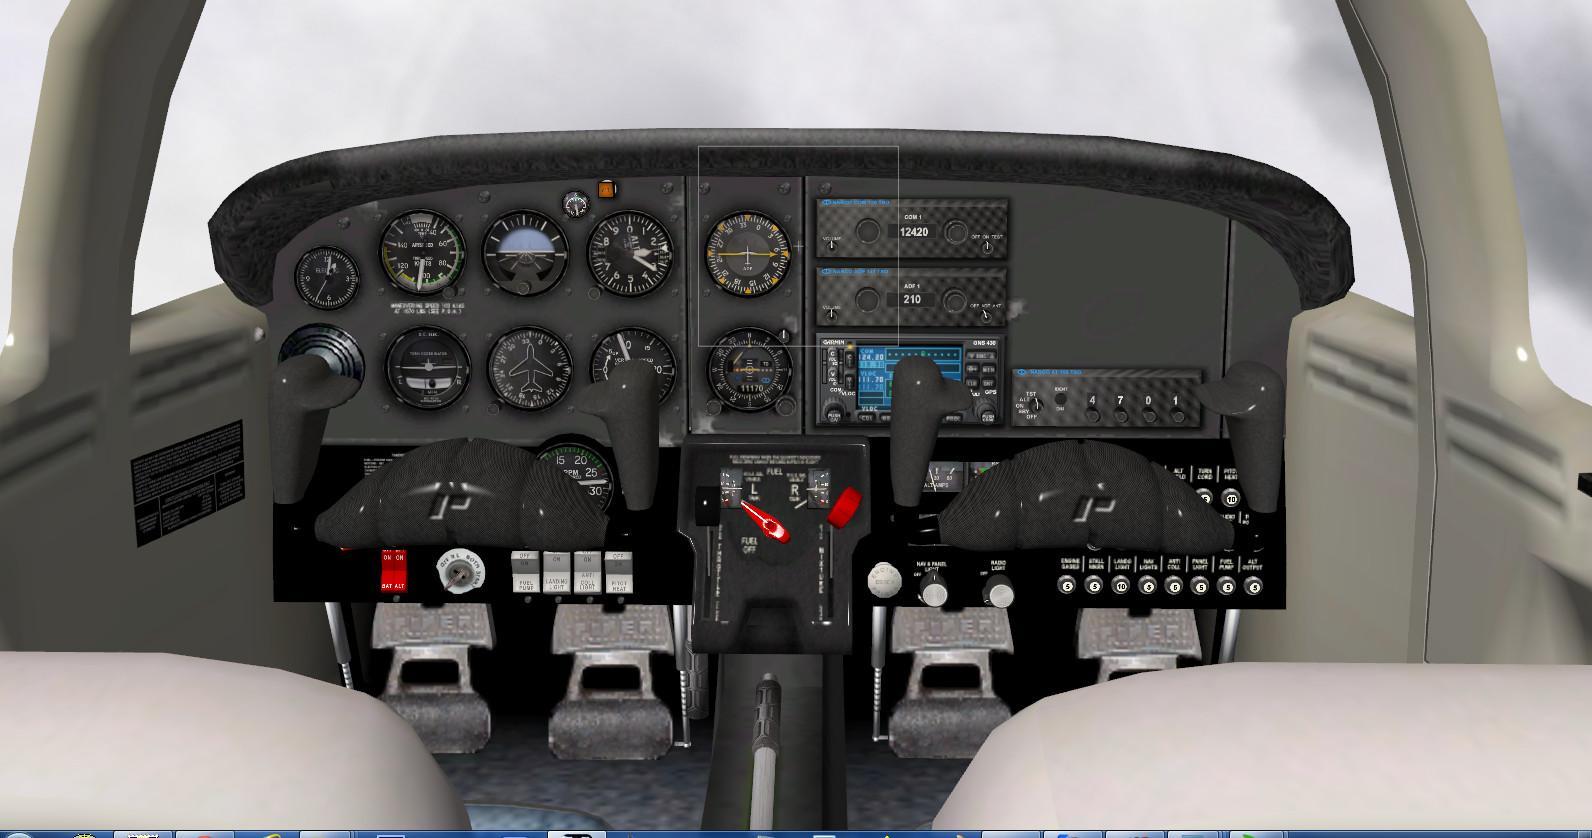 X-Plane 9 aircraft - Rikoooo